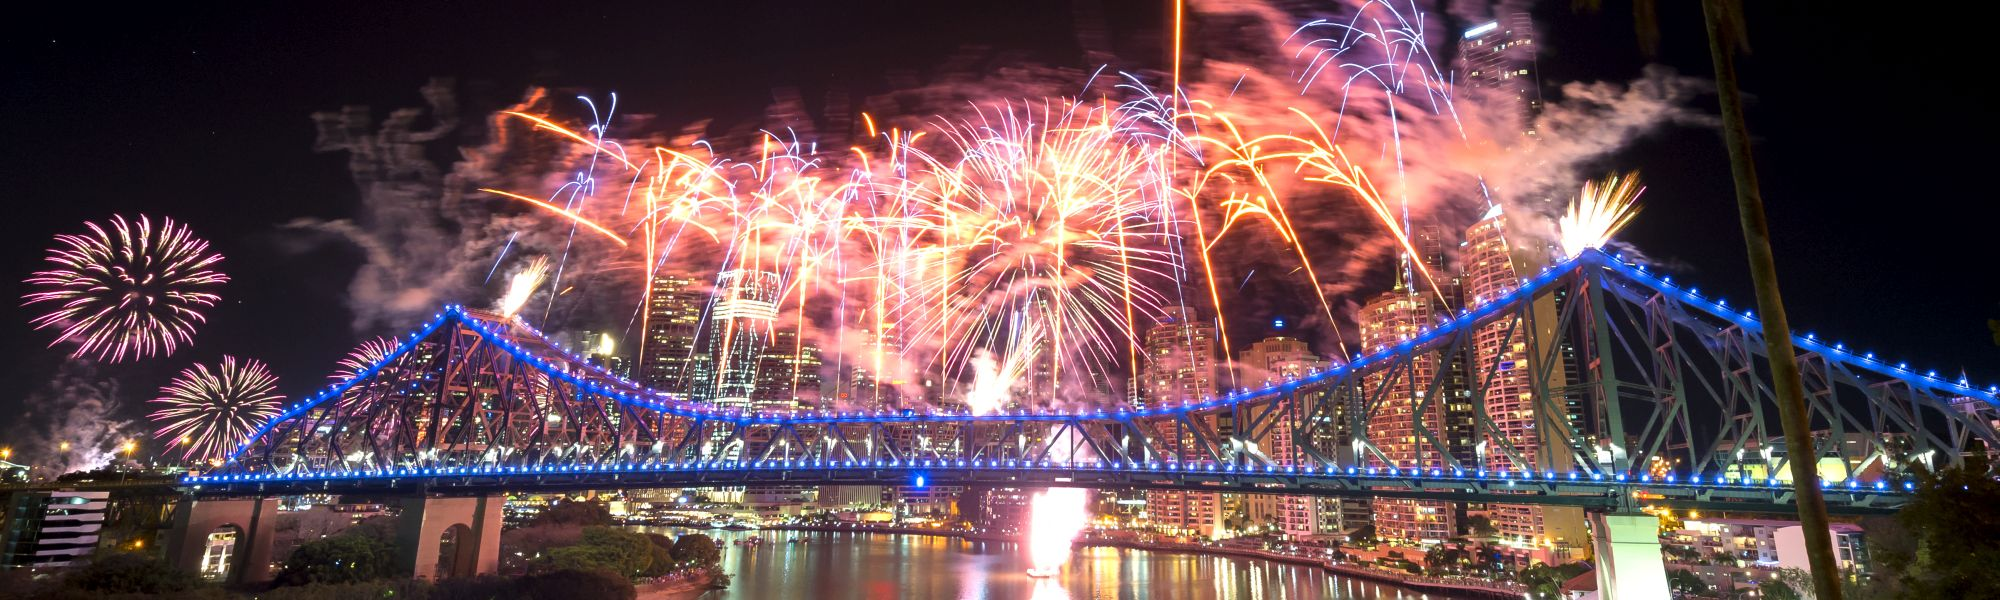 Story-Bridge-Fireworks-CREDIT-Lauren-Bath